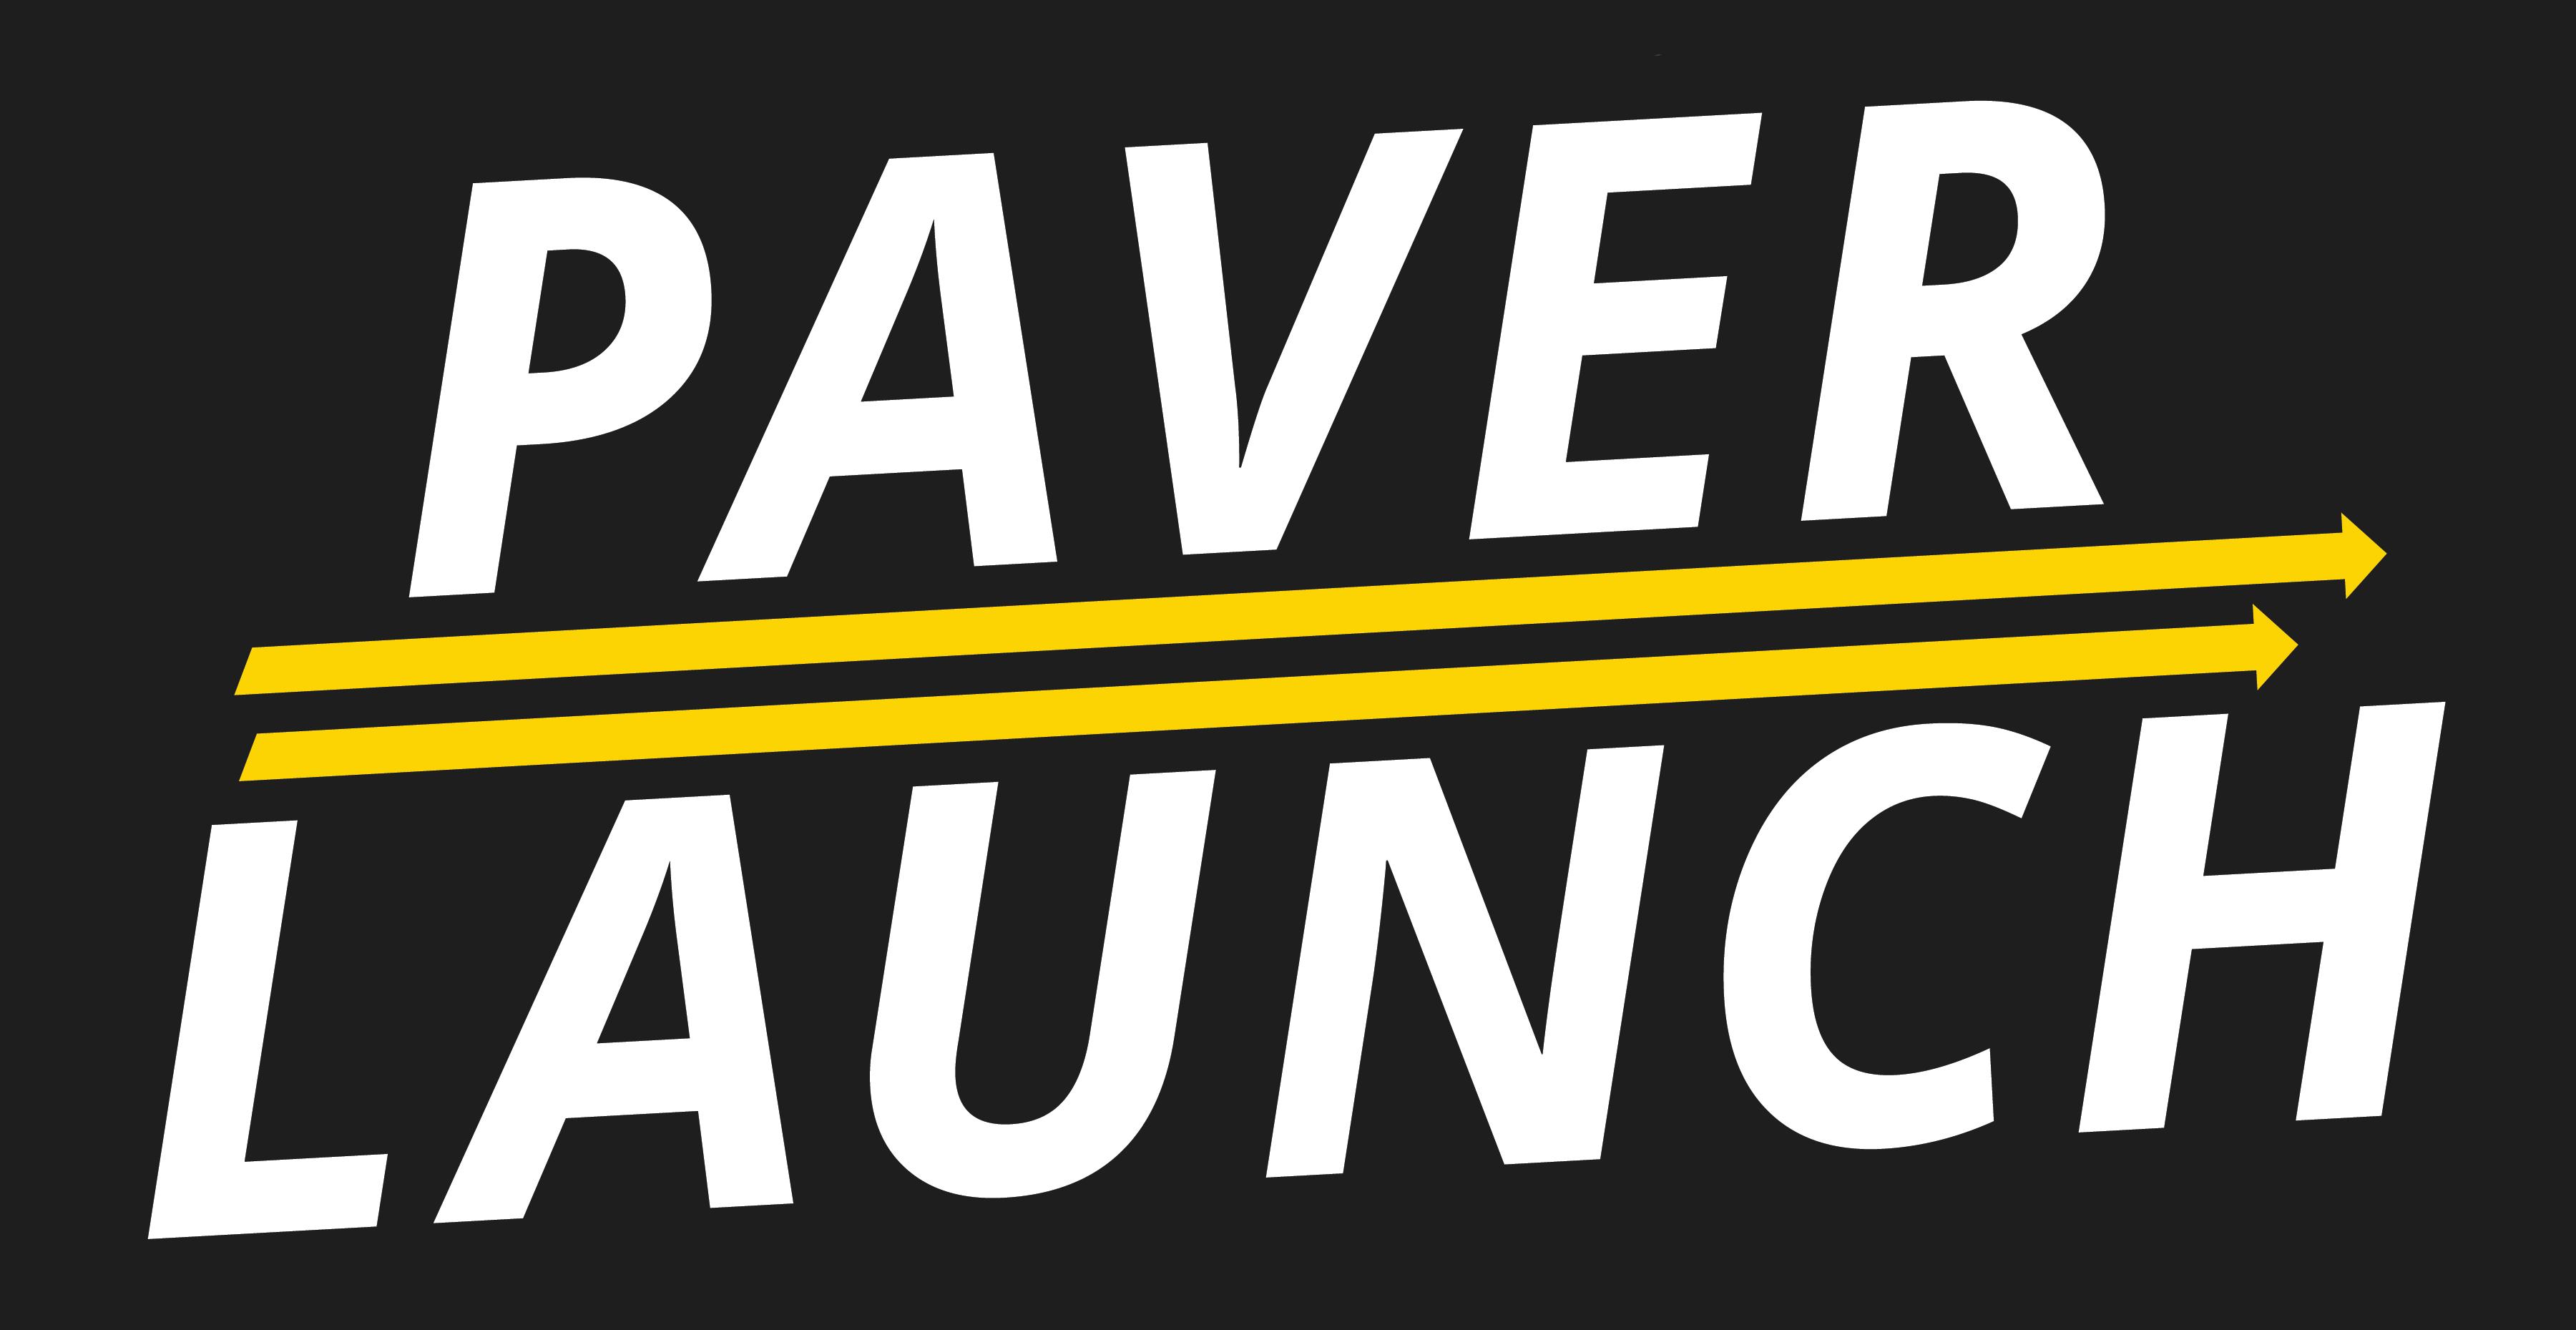 Paver Launch logo